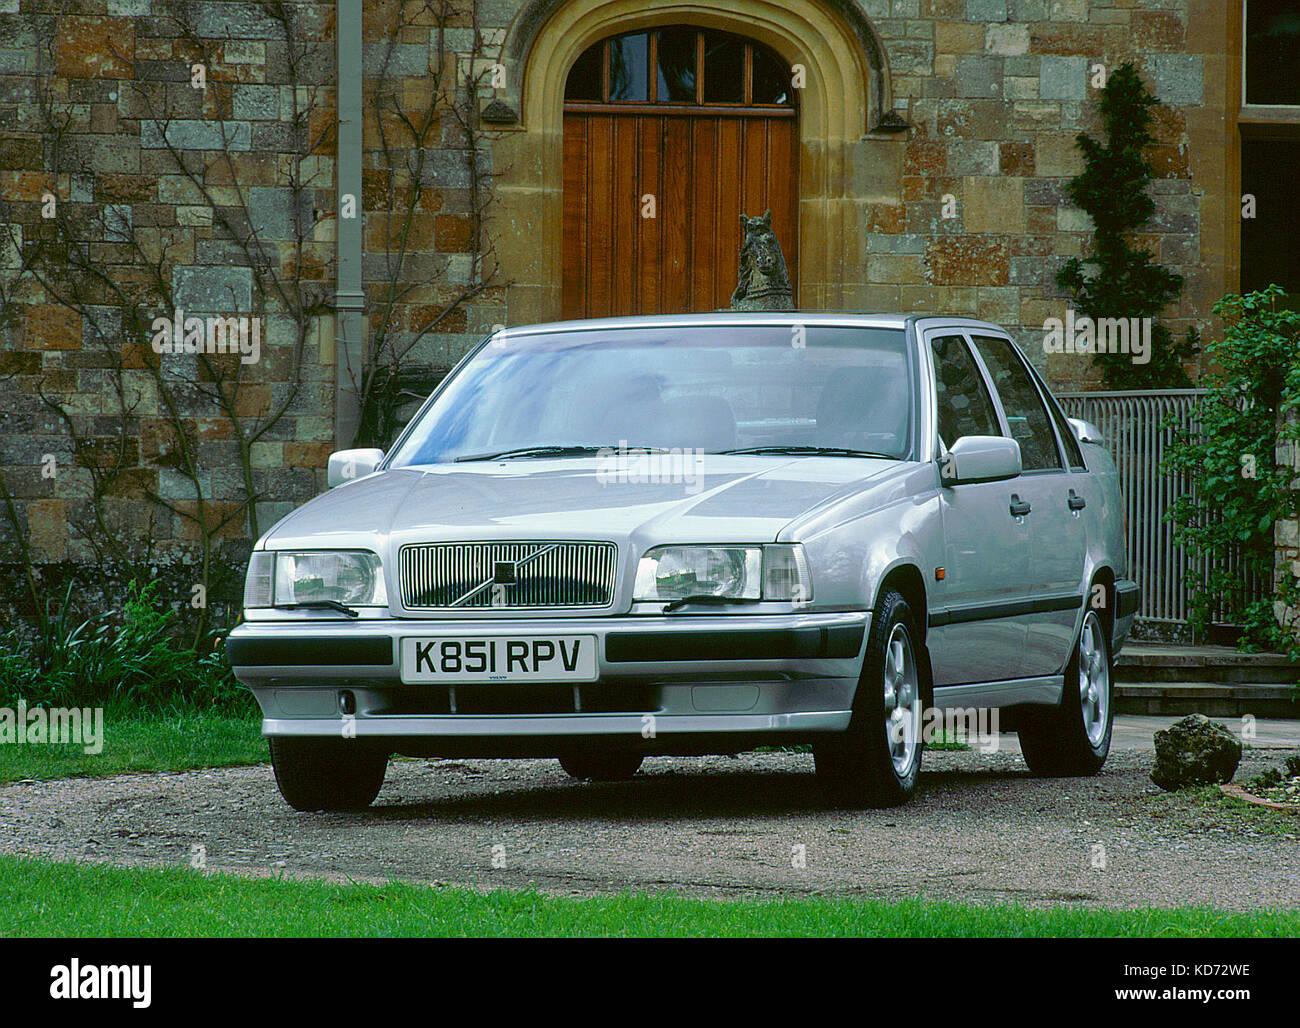 1992 Volvo 850 GLT - Stock Image